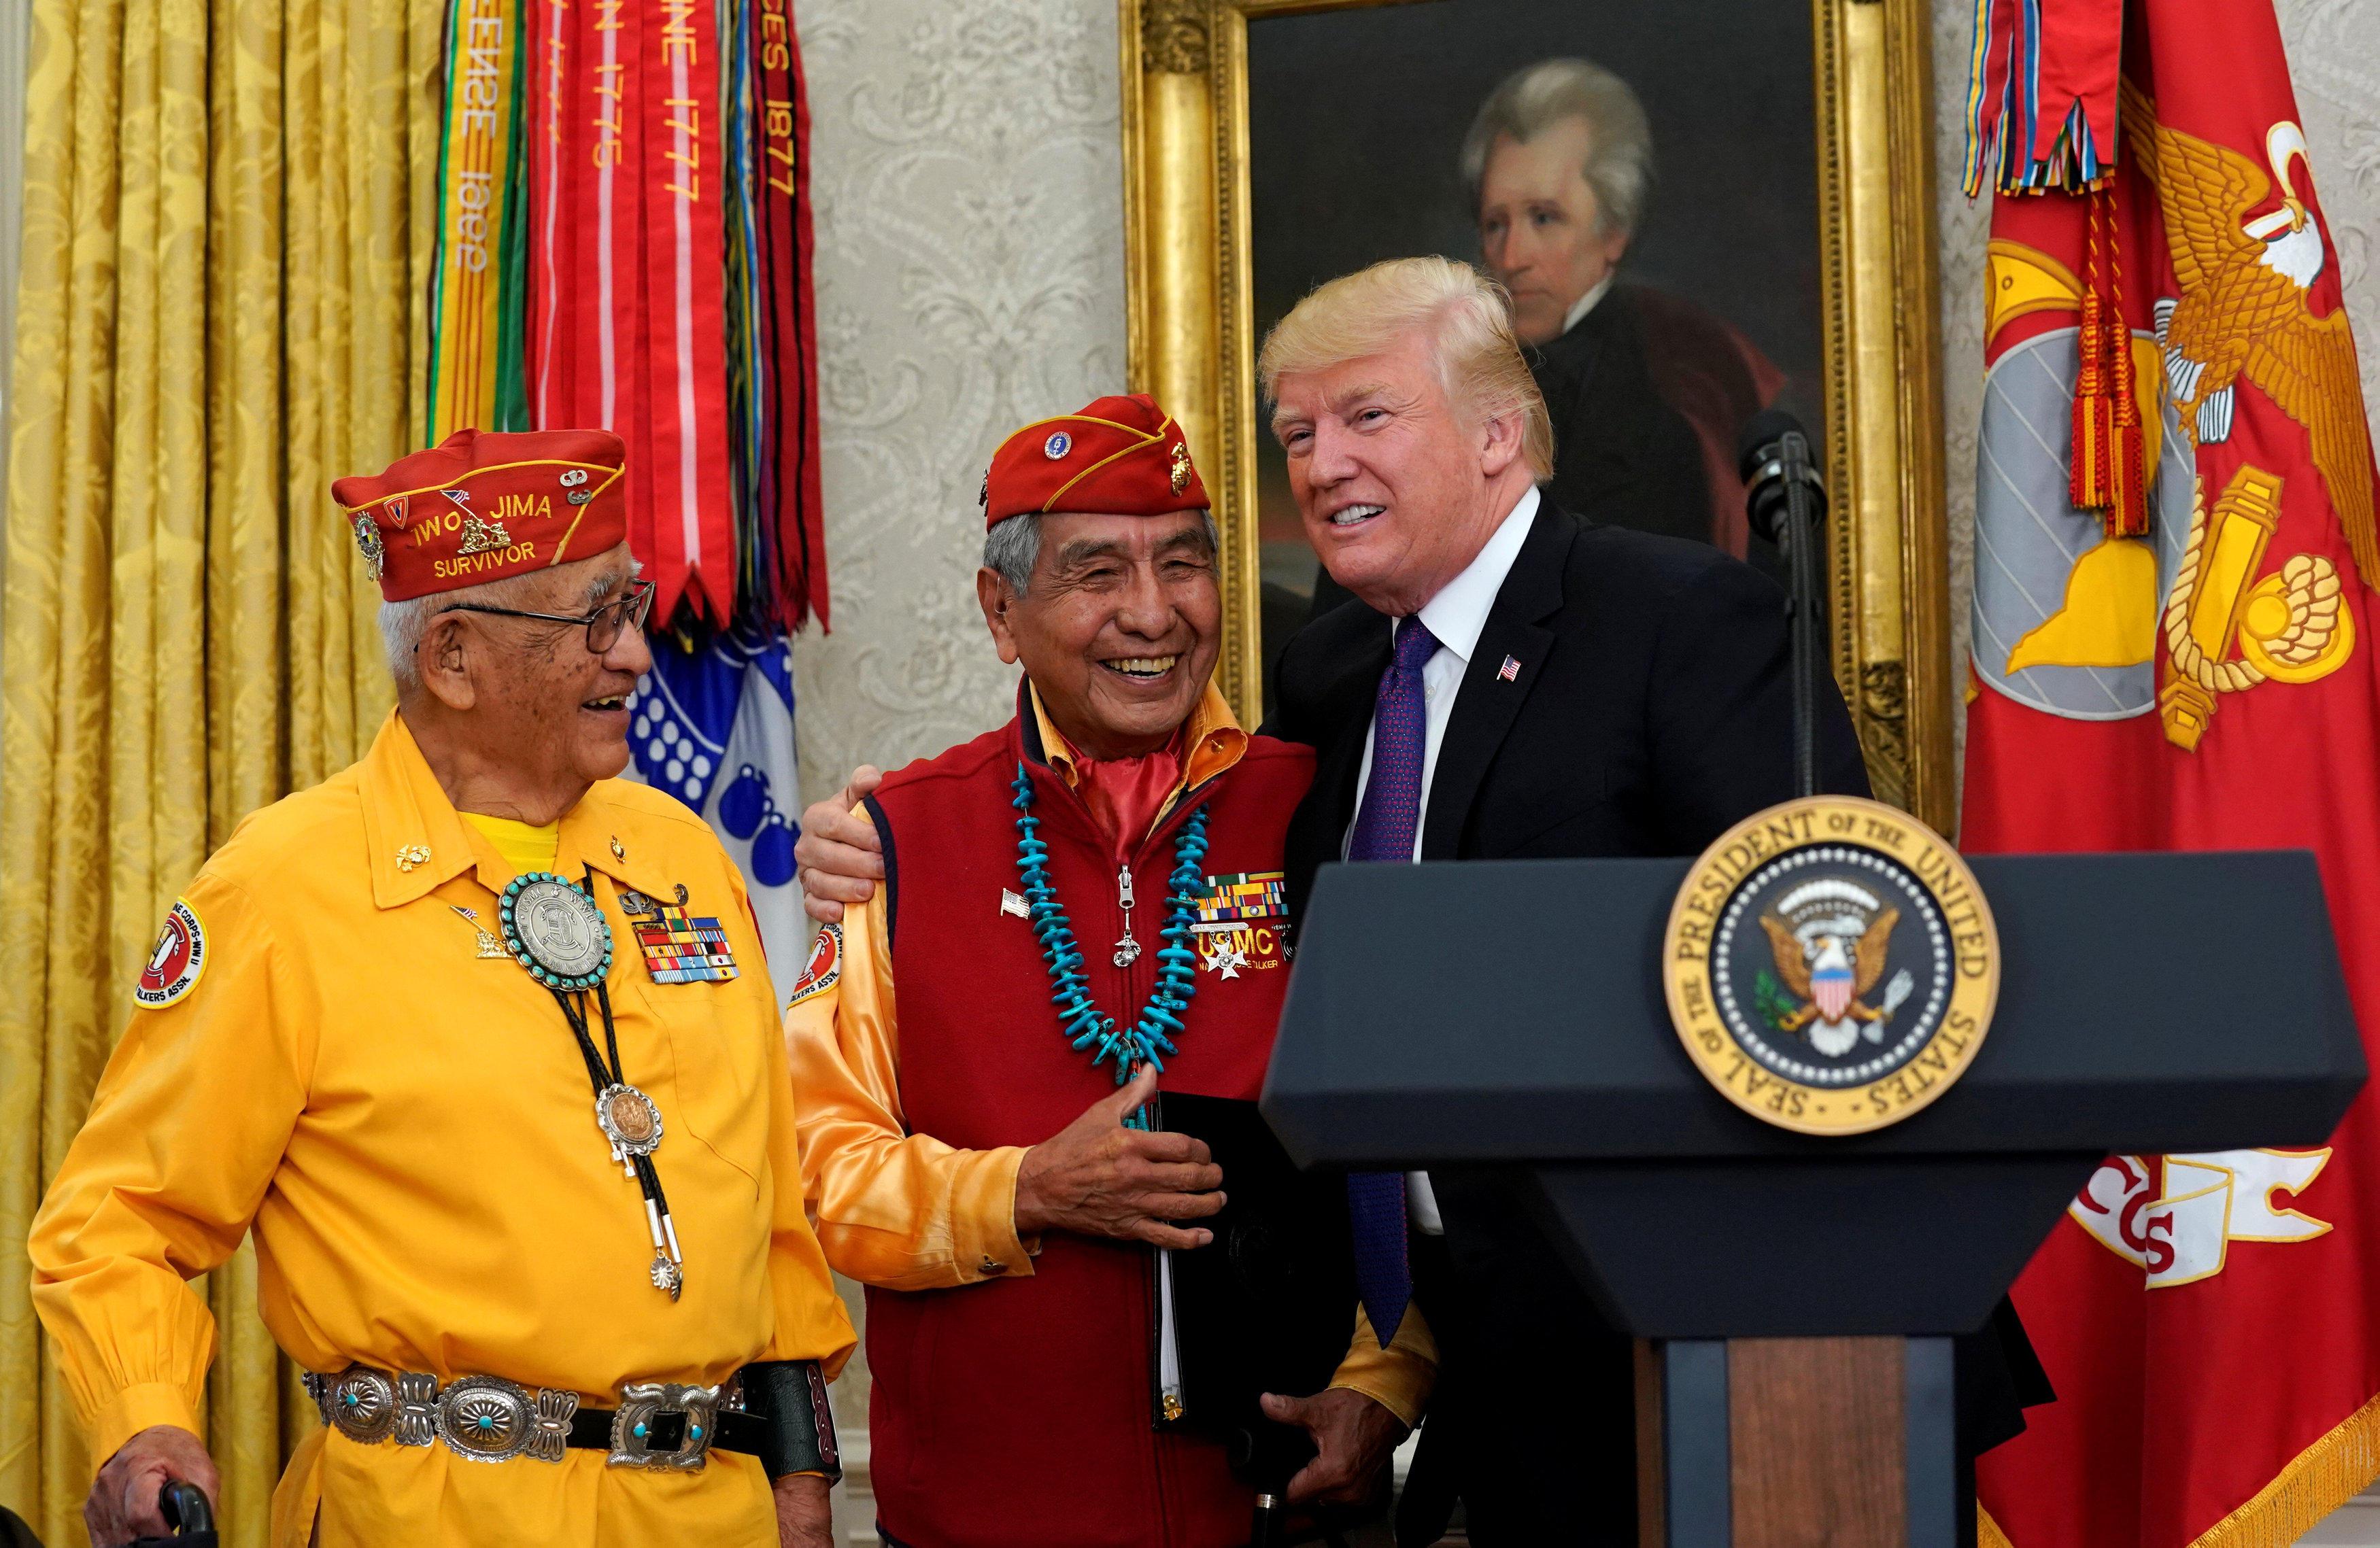 trump makes pocahontas remark referring to sen warren at navajo